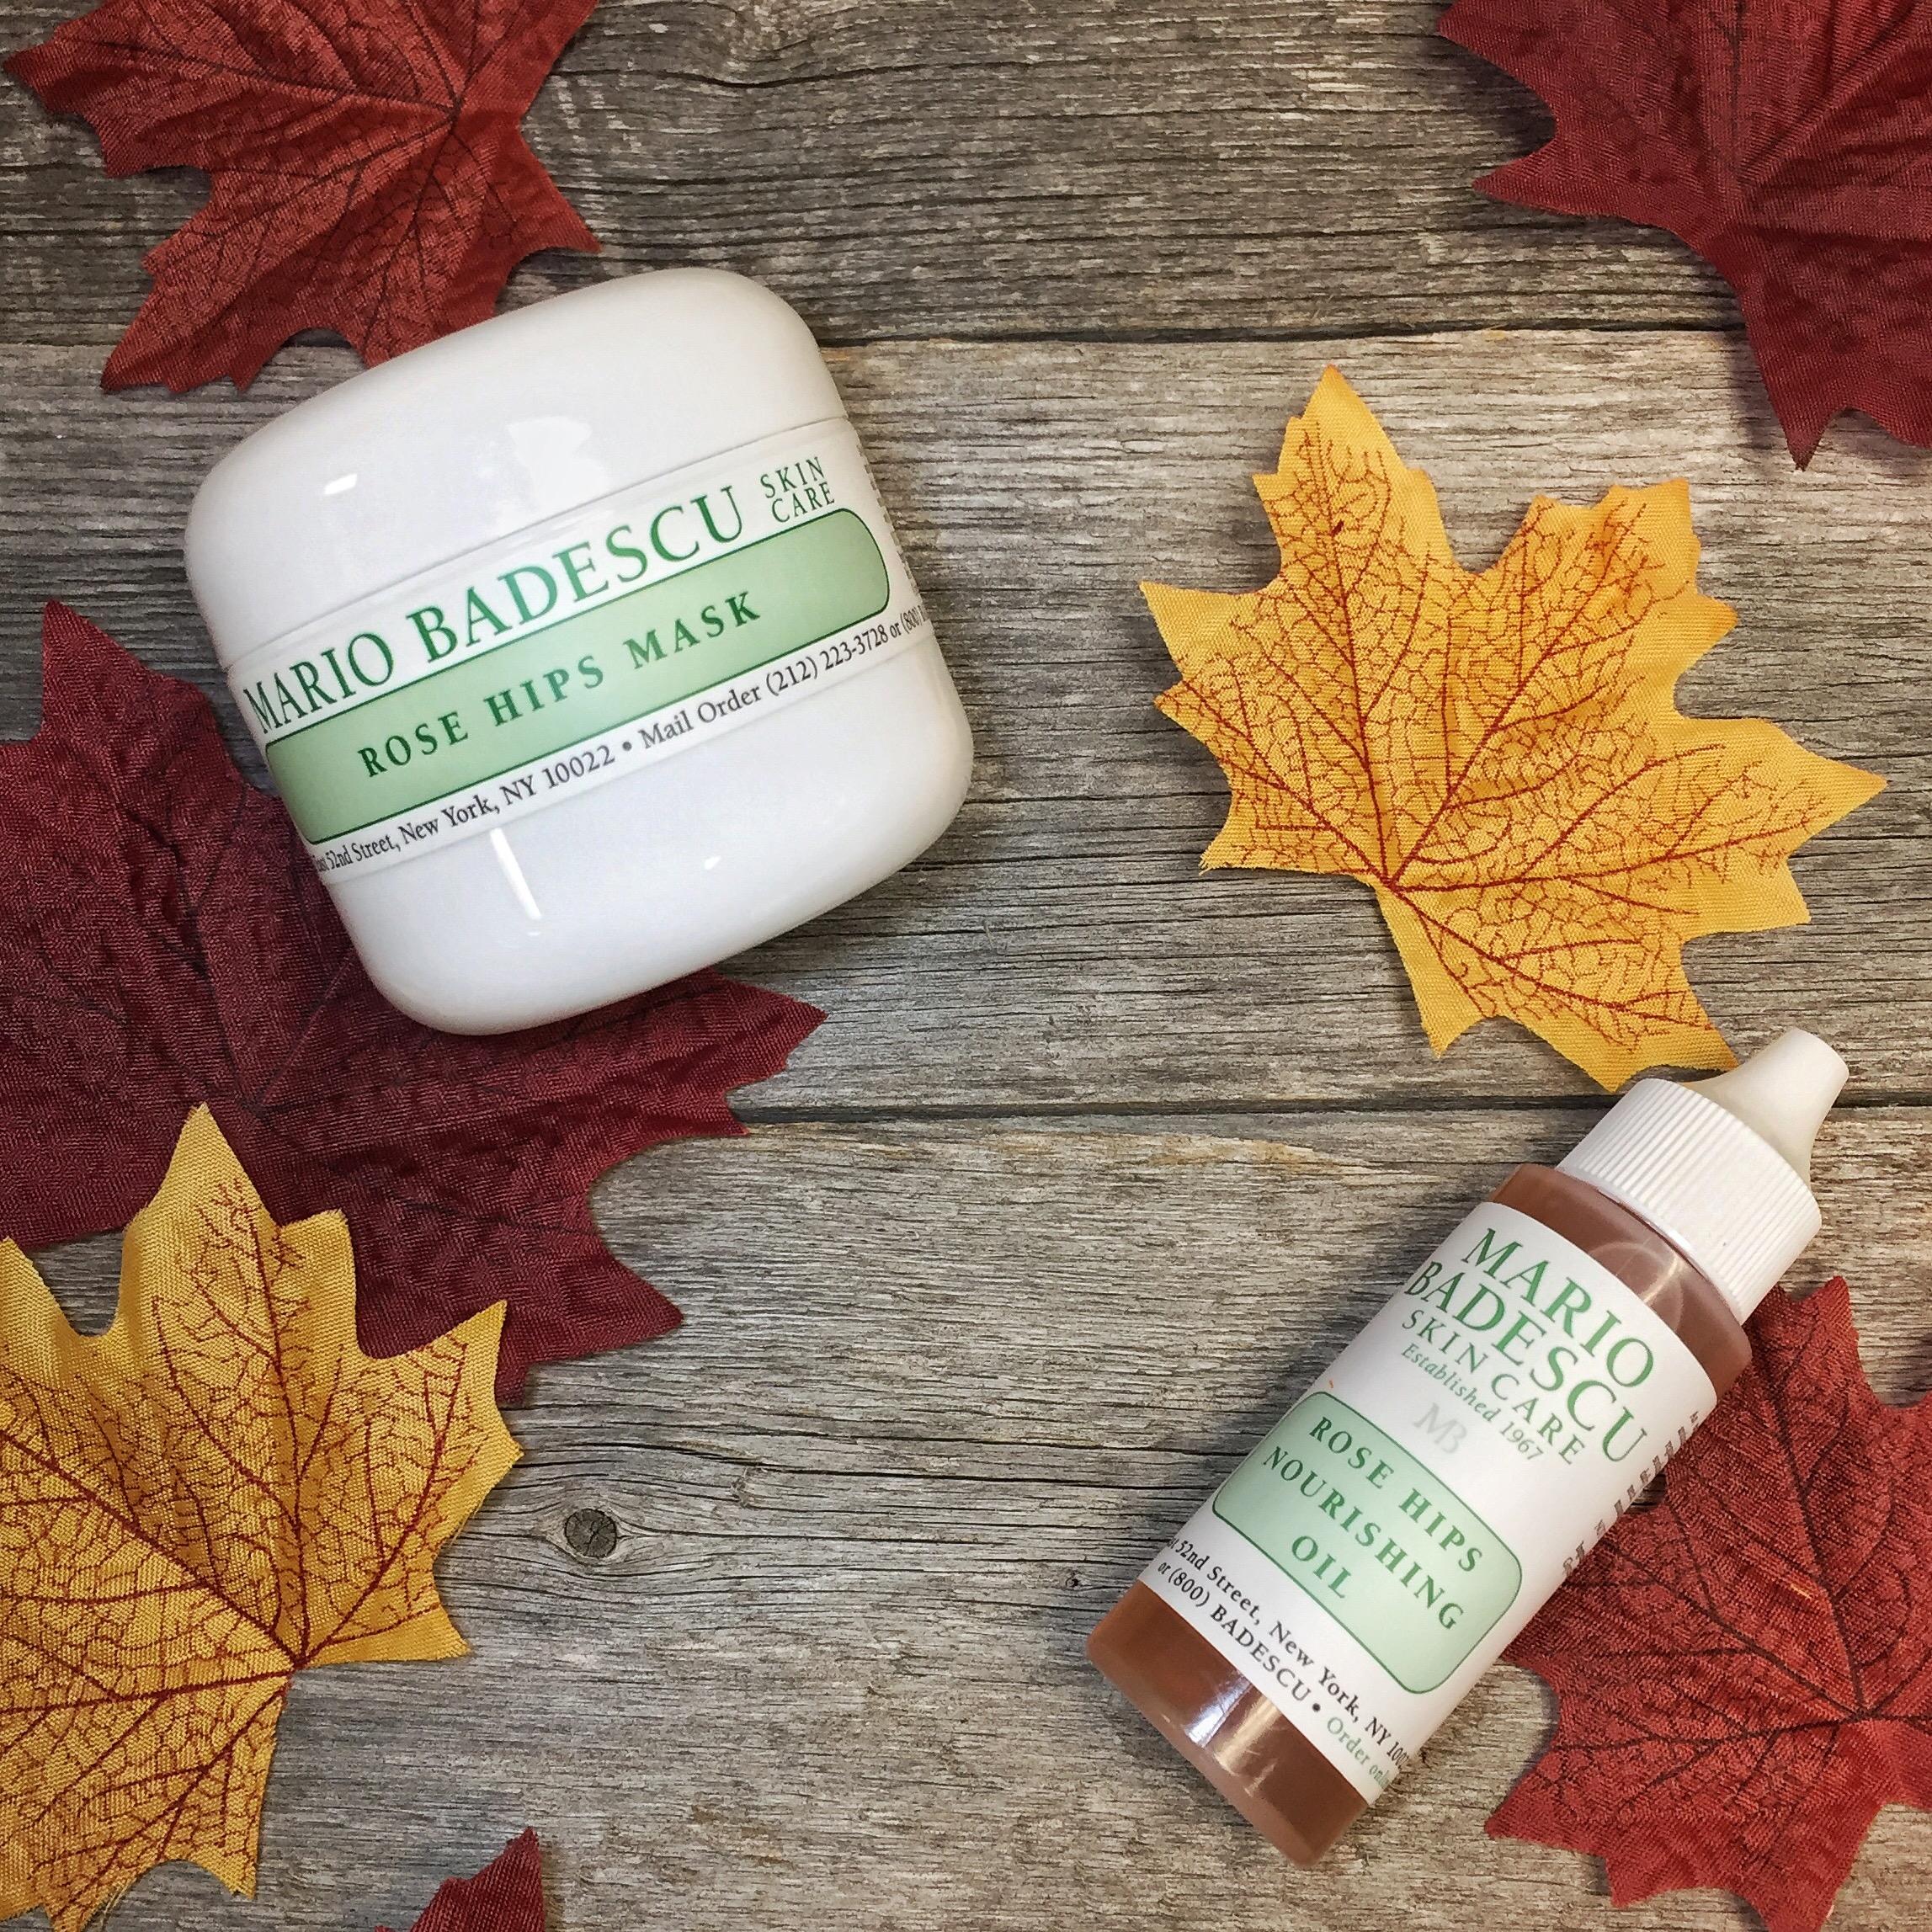 Rose Hip Skin Care Benefits